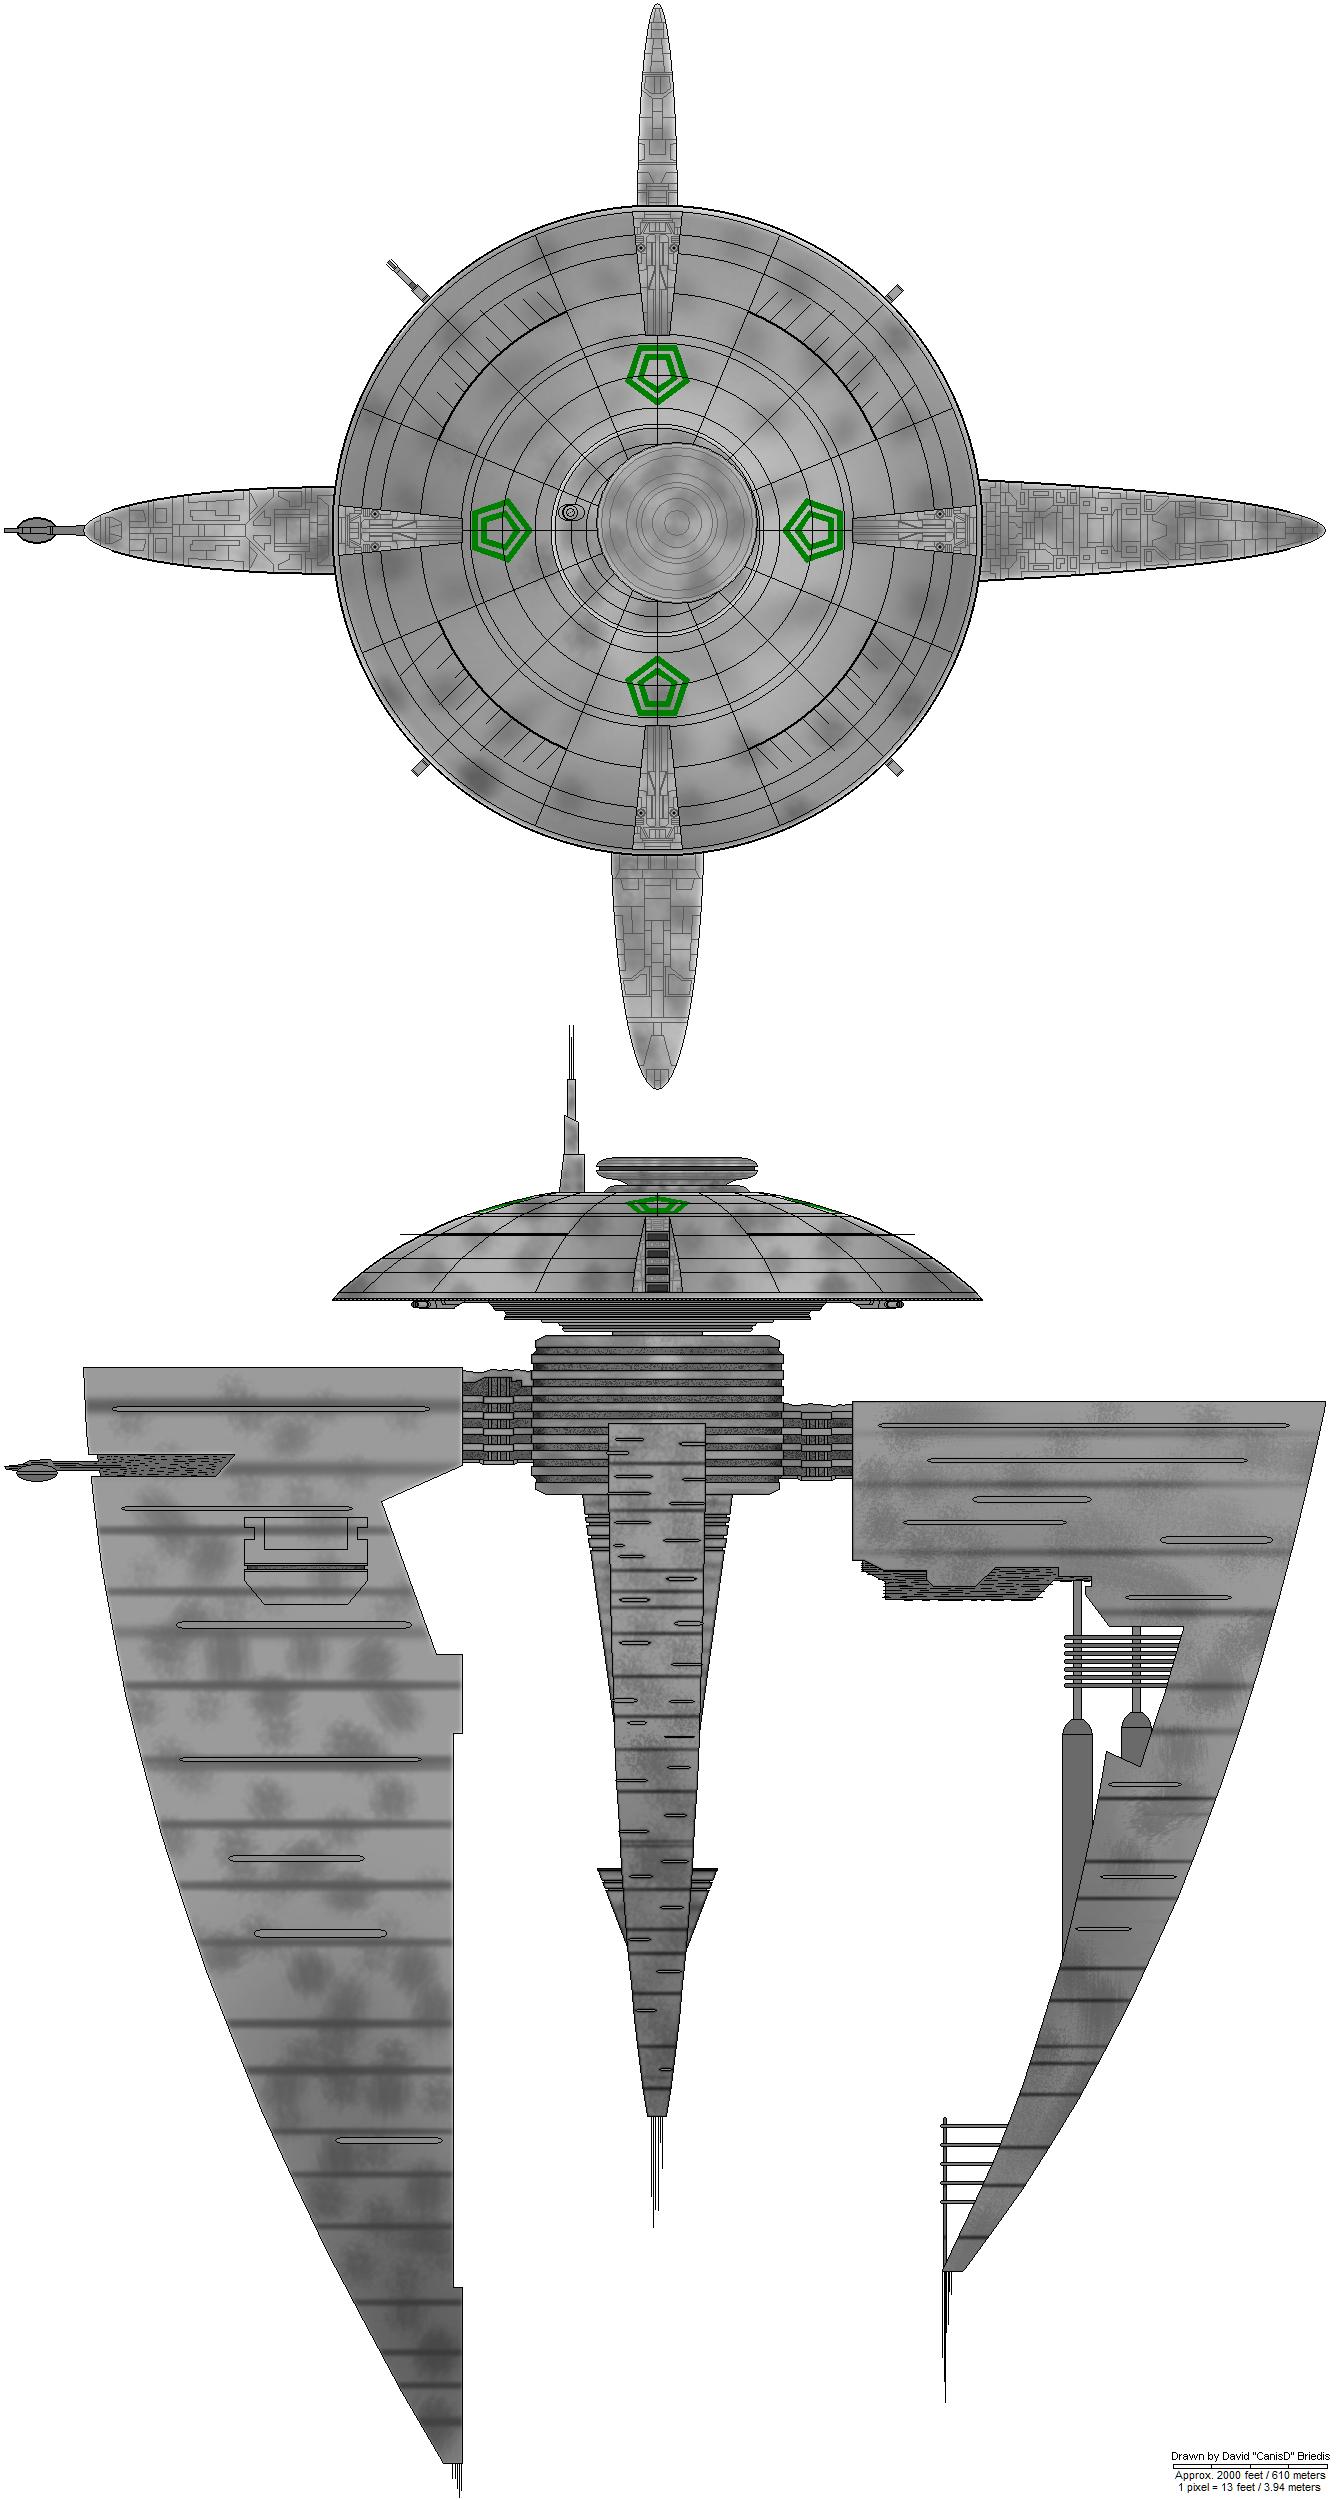 battlestar galactica | Battlestar Galactica, référence du ...  |Battlestar Galactica Spacecraft